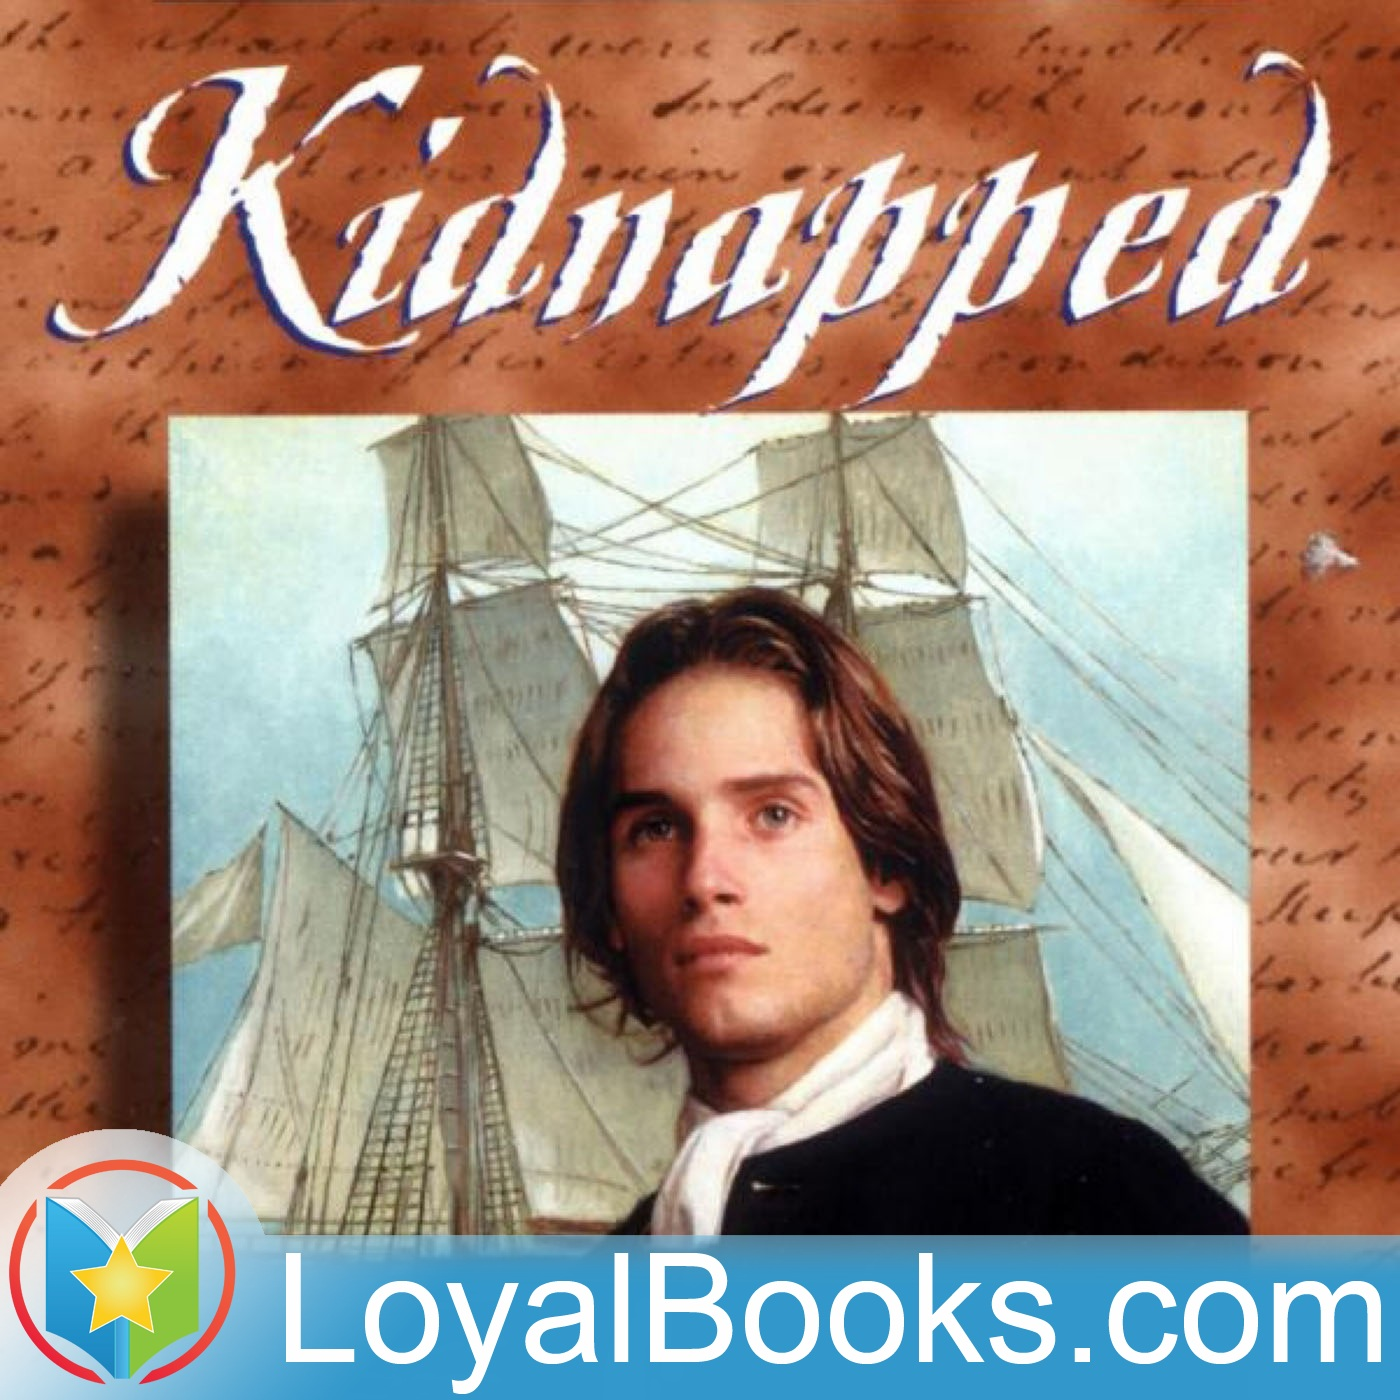 <![CDATA[Kidnapped by Robert Louis Stevenson]]>